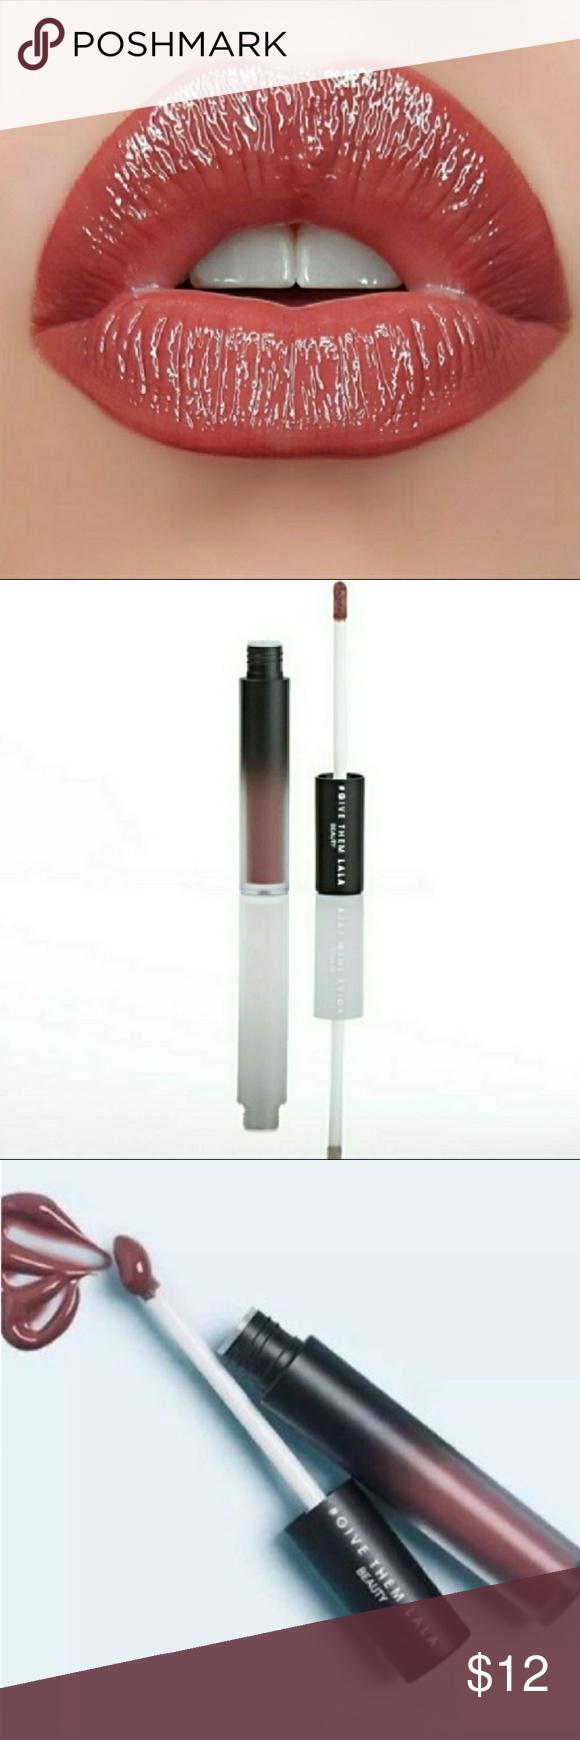 Give them lala beauty the affair lip gloss NWT Lip gloss